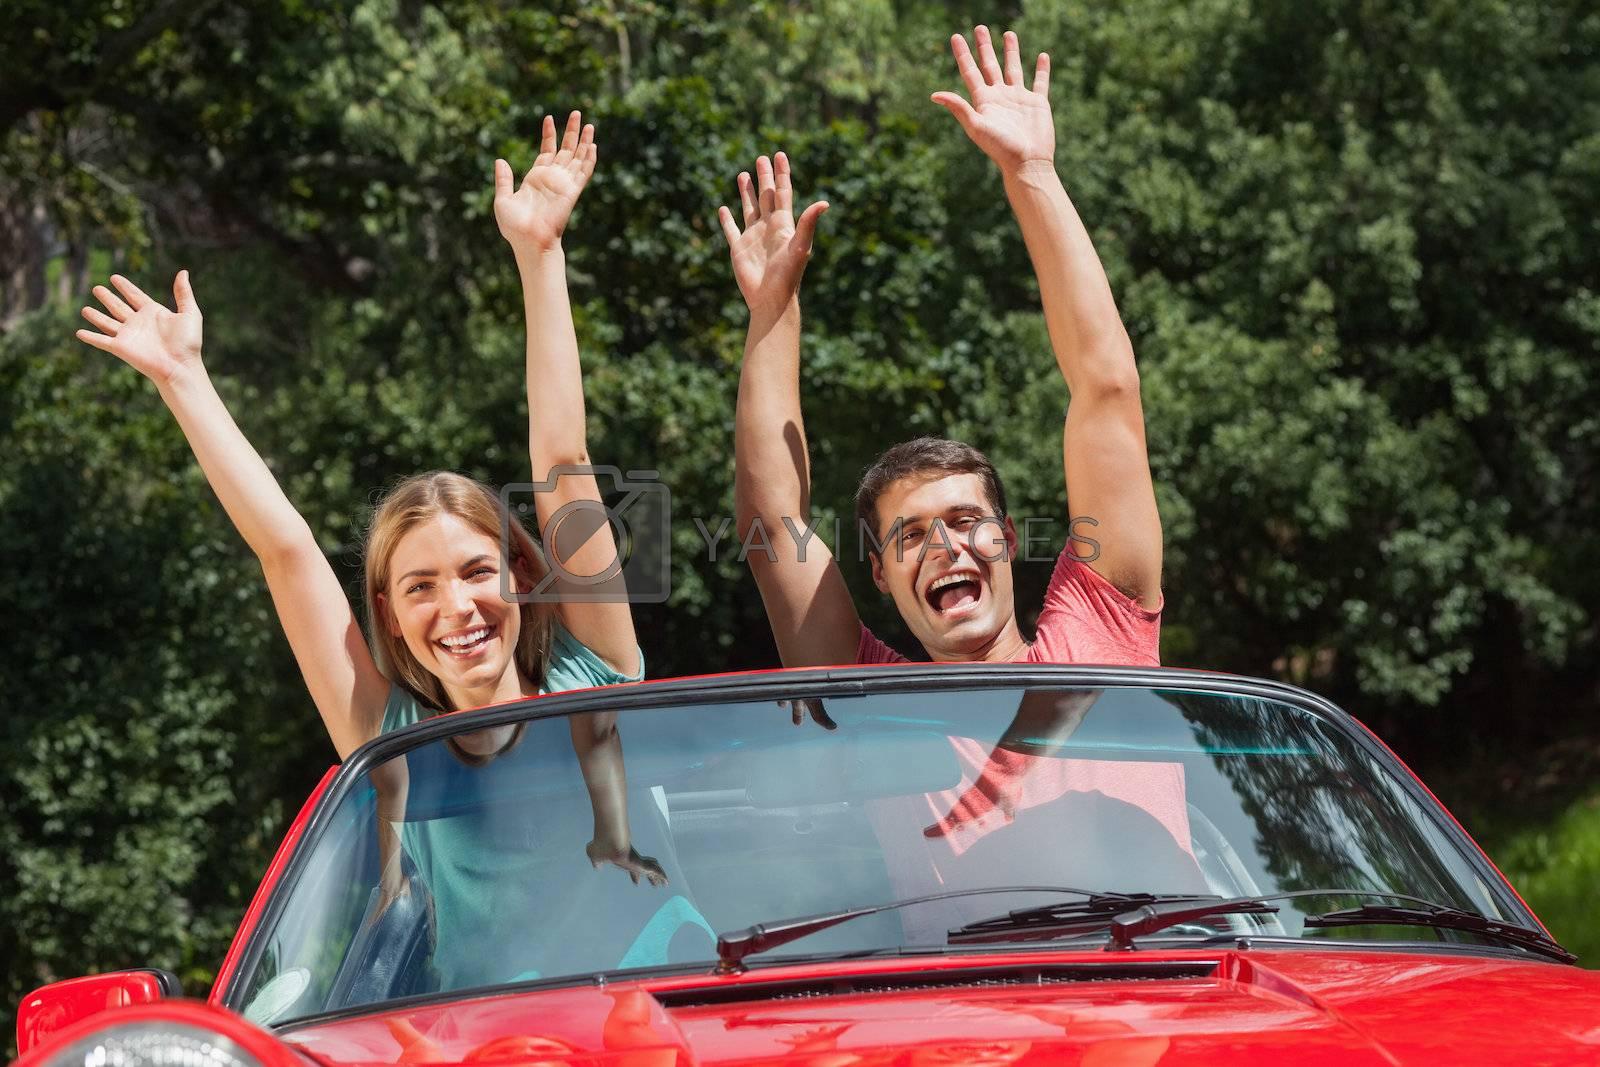 Happy couple having fun in their cabriolet by Wavebreakmedia